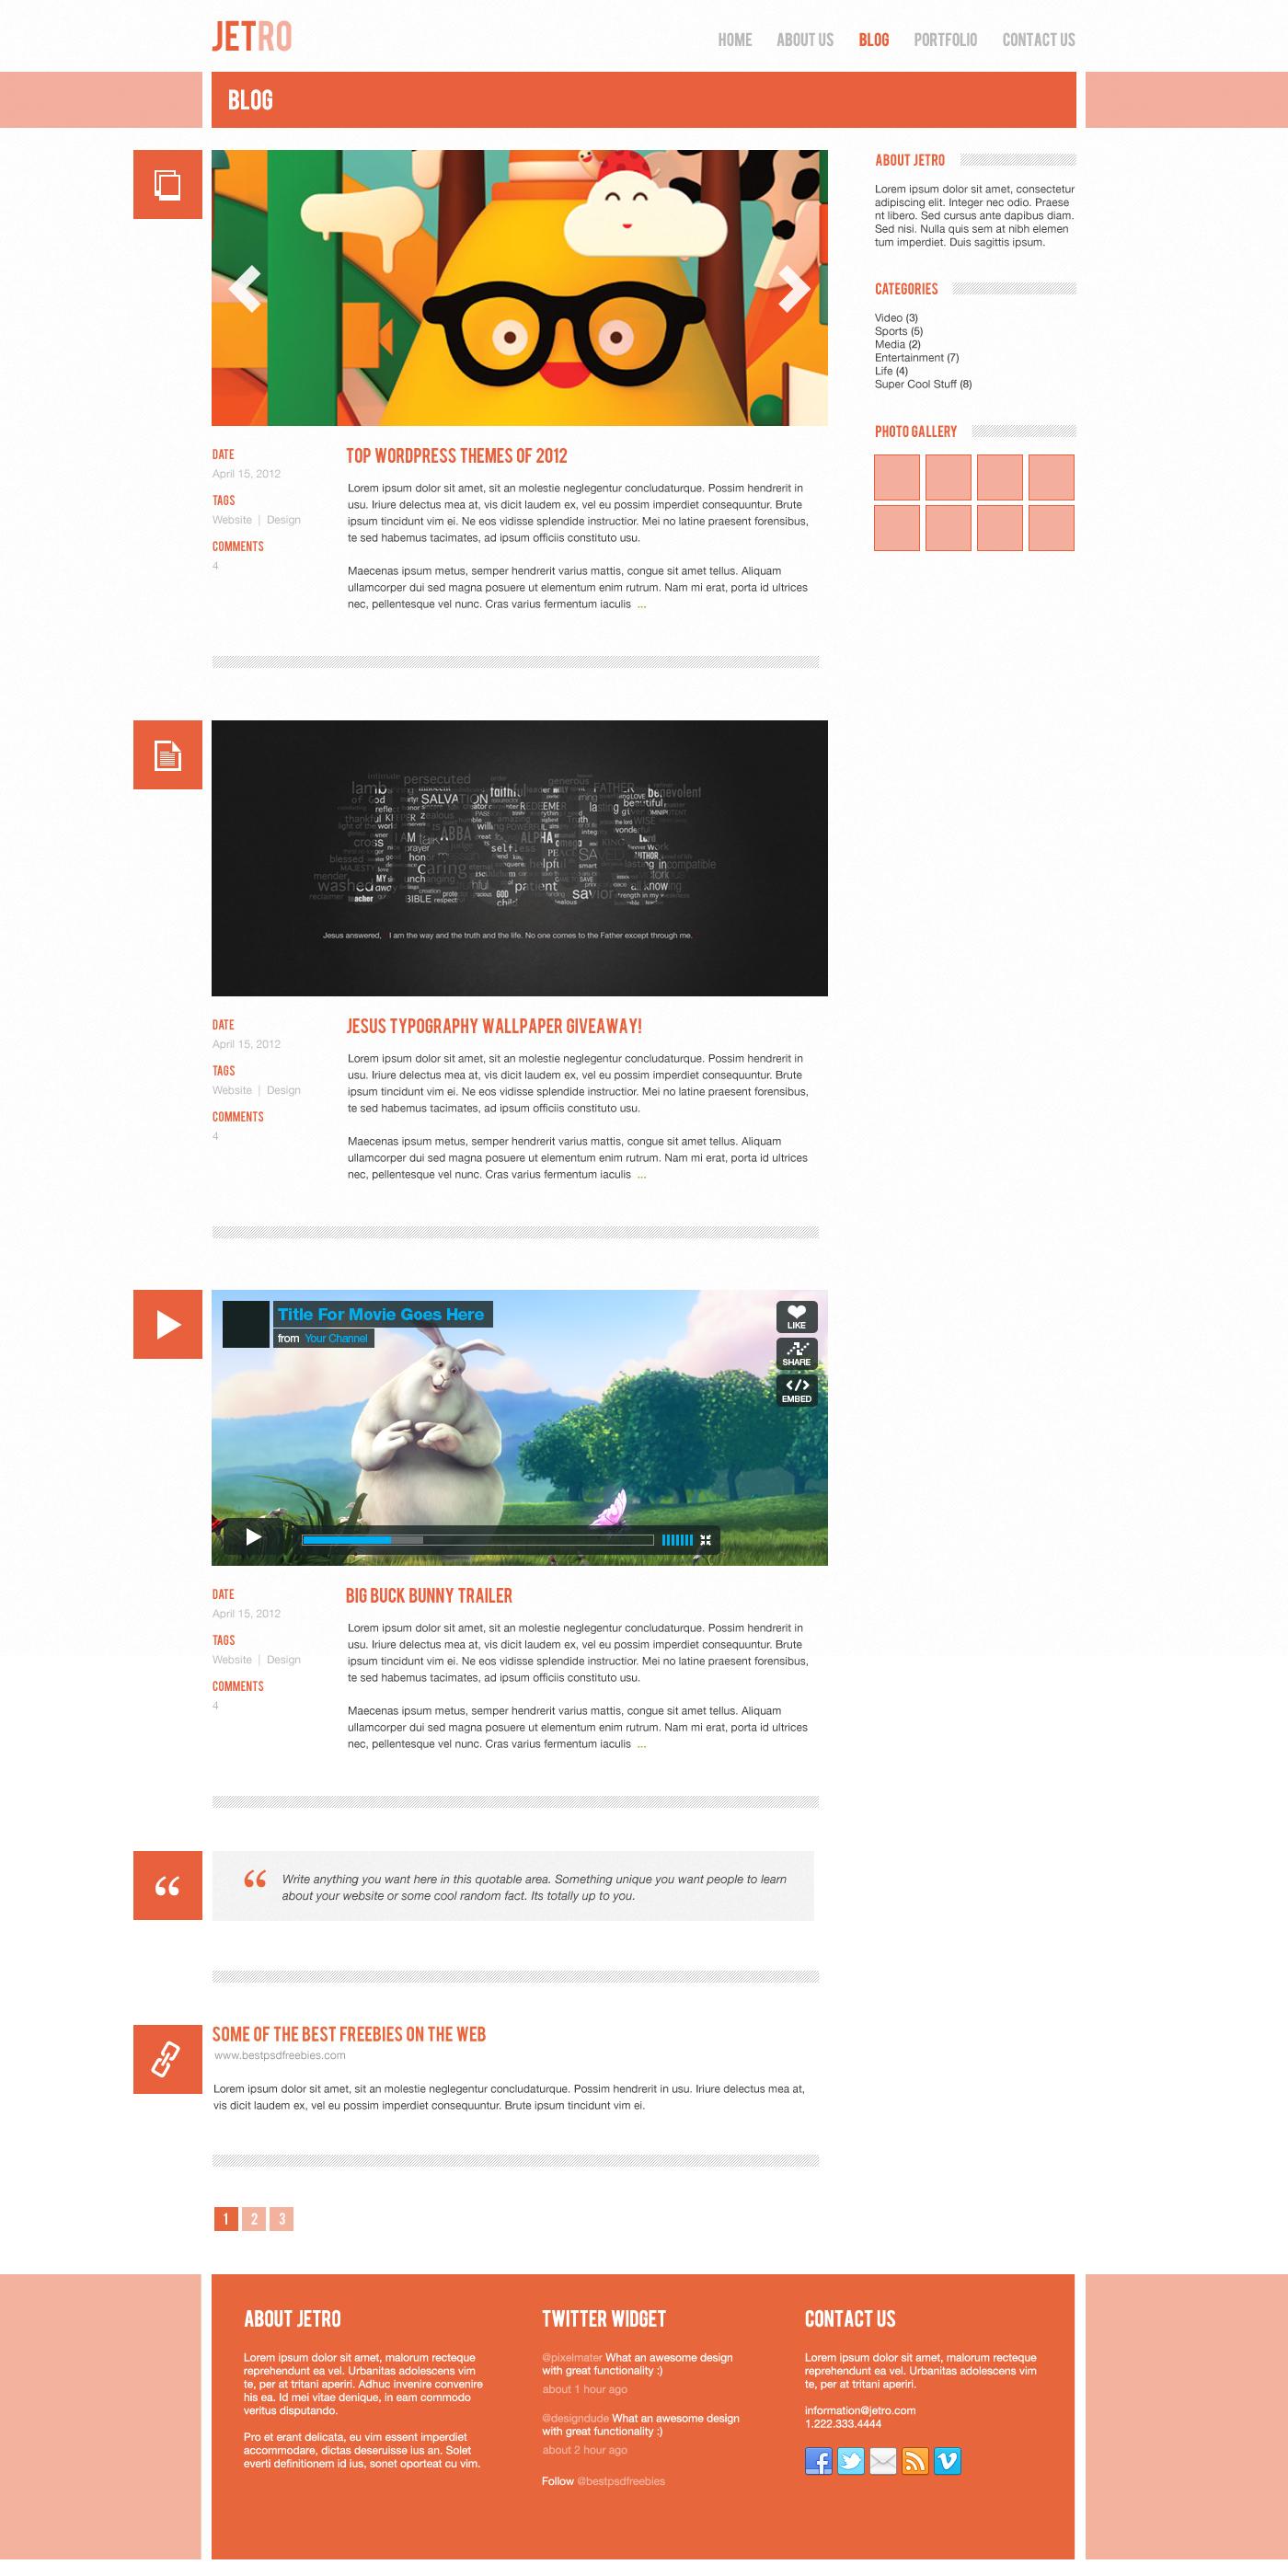 jetro-psd-responsive-html-template-blog